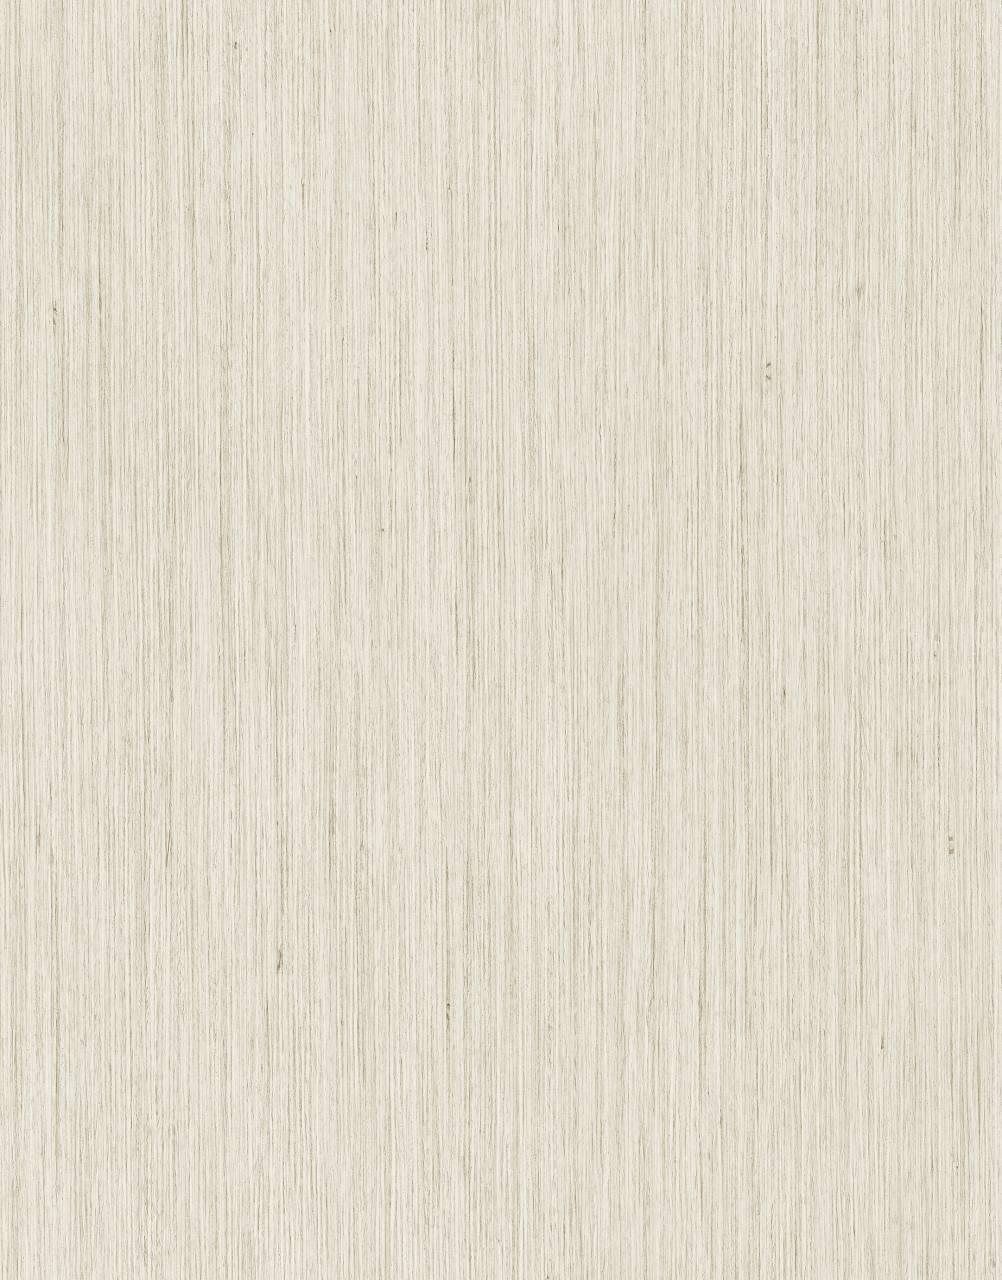 8547 Fineline Crème (MF PB sample)